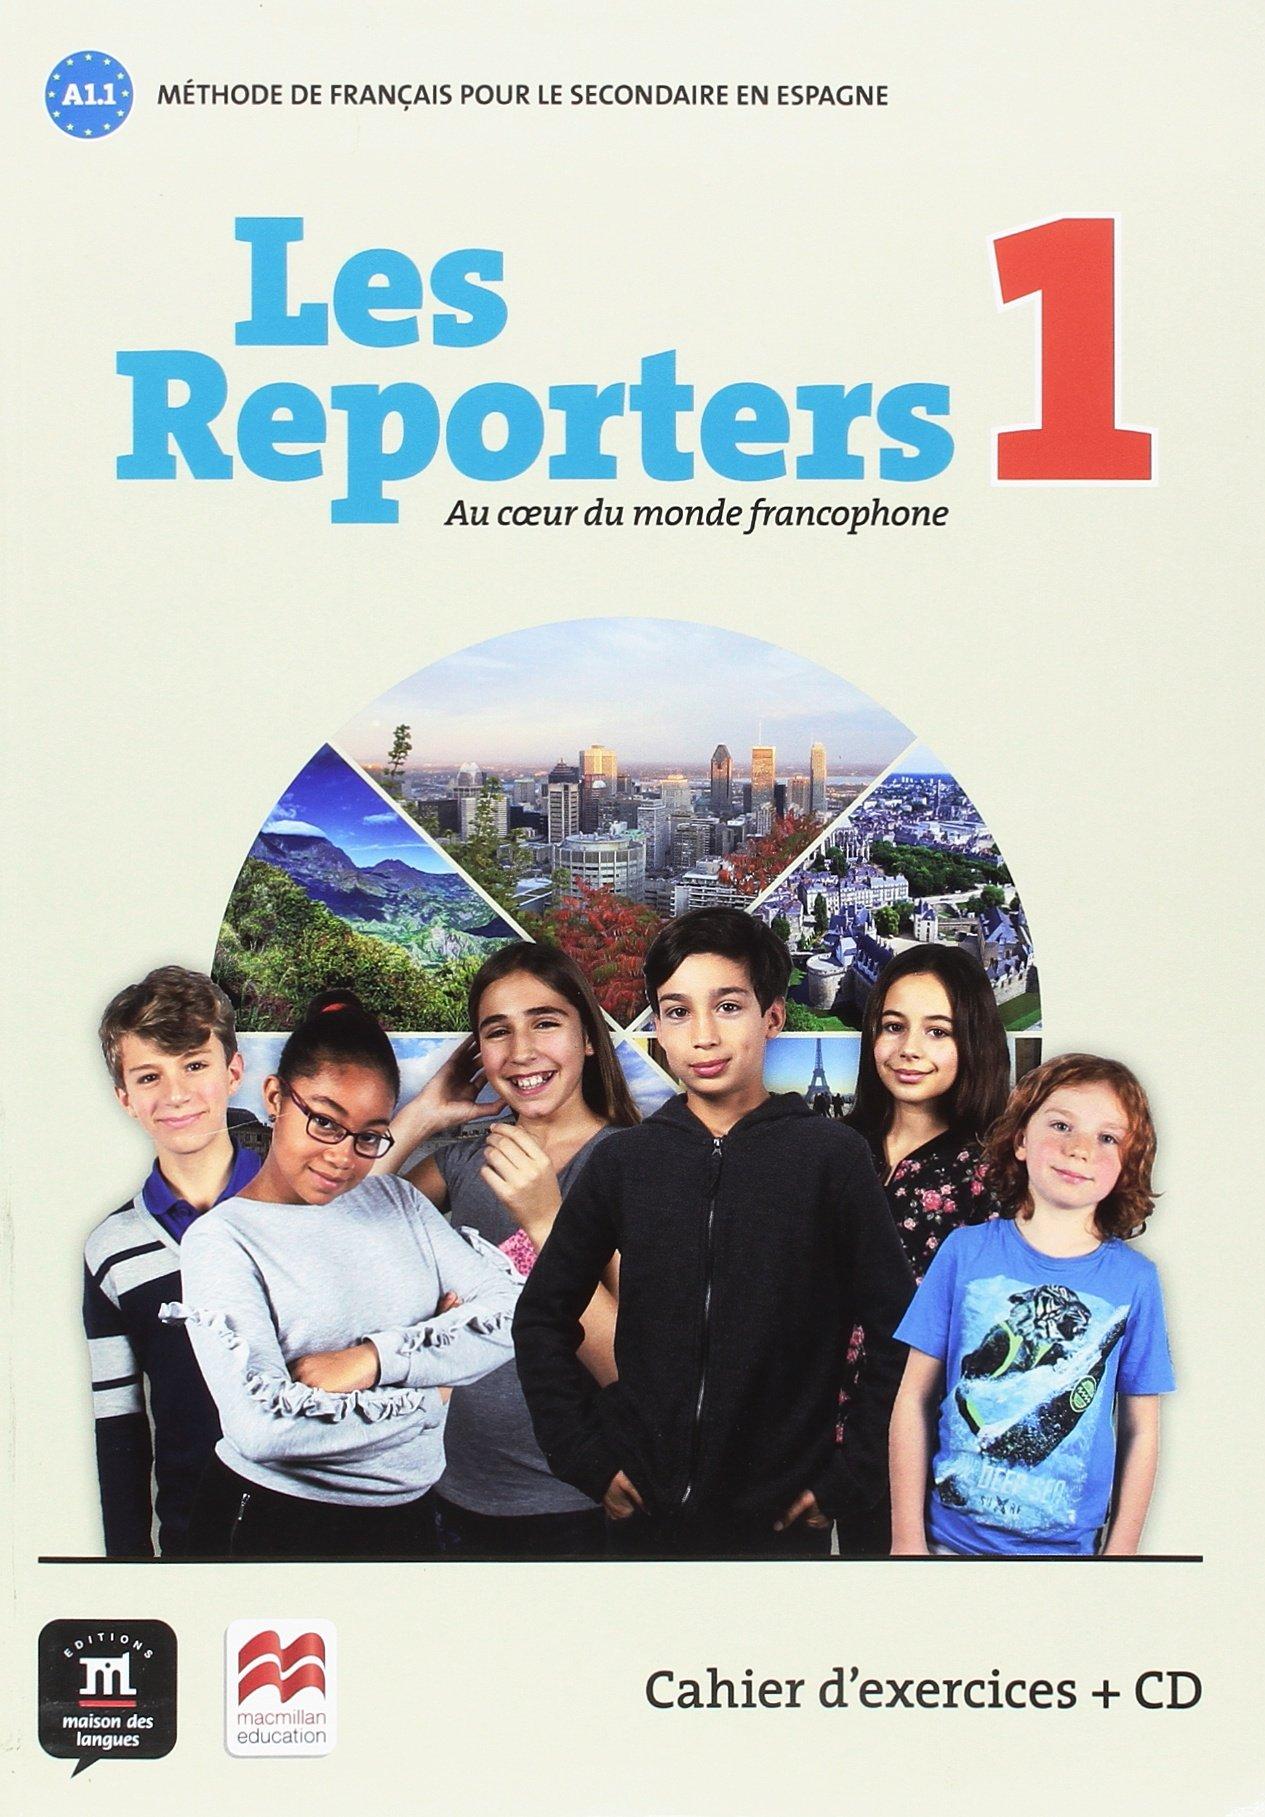 Les Reporters 1: Au coeur du monde francophone: Amazon.es: Gwnendoline Le Ray, Stéphanie Pace: Libros en idiomas extranjeros